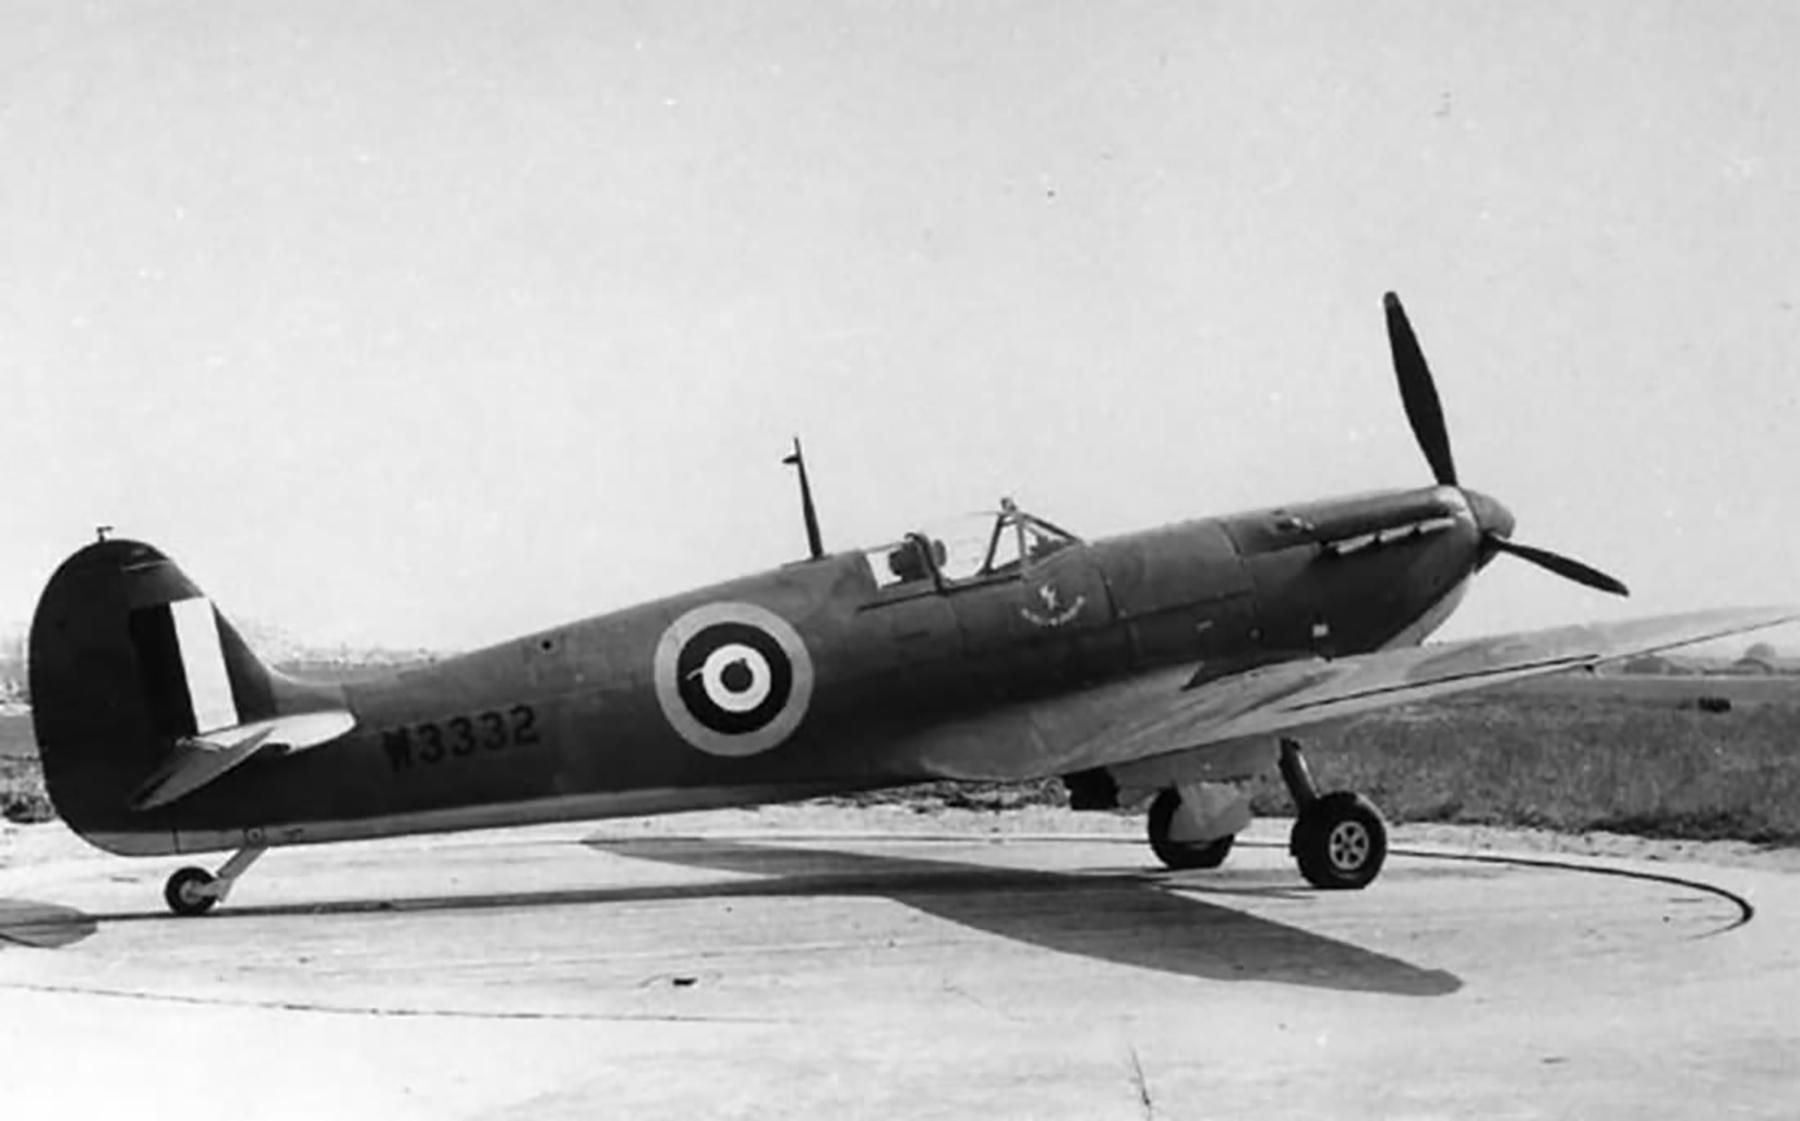 Factory fresh Spitfire MkVb RAF W3332 1941 web 01